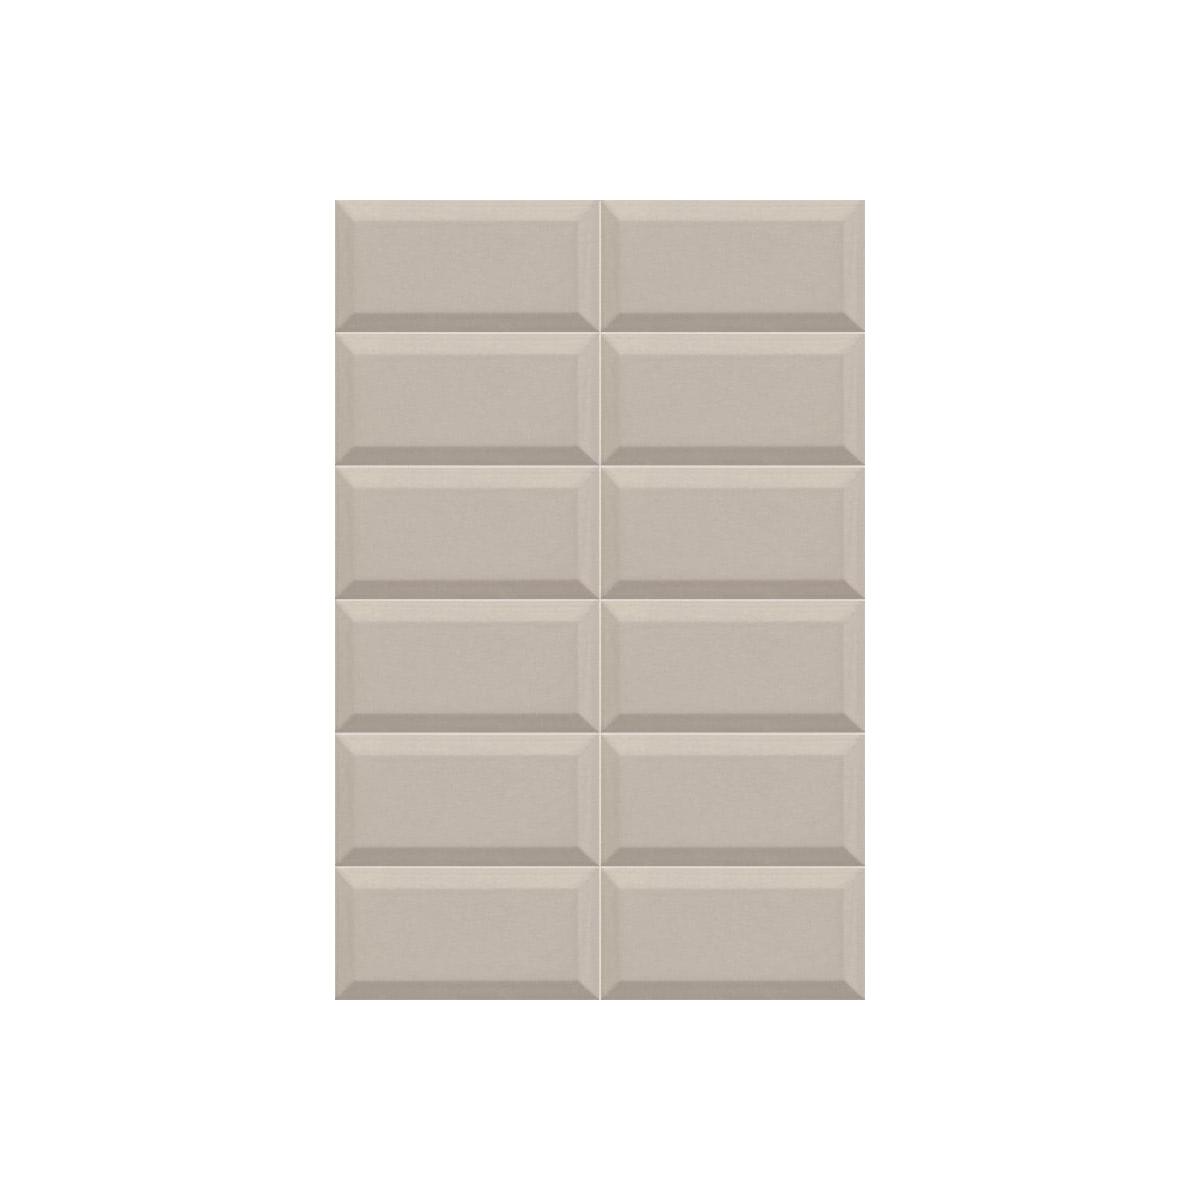 Bissel gris plata brillo 10x20 (m2)